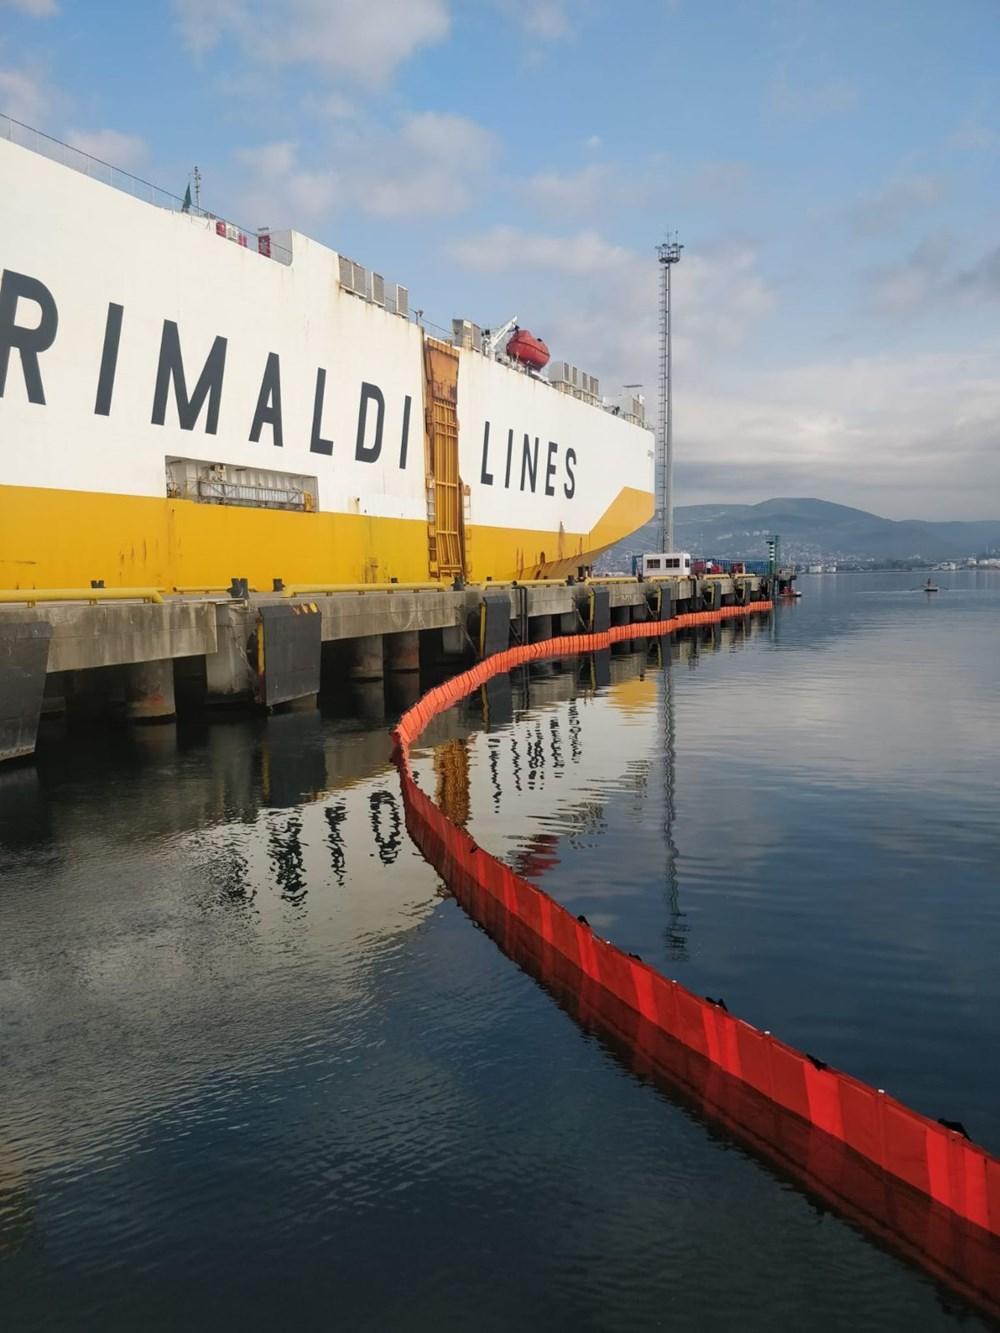 İzmit Körfezi'ni kirleten gemiye 3,4 milyon lira ceza uygulandı - 4